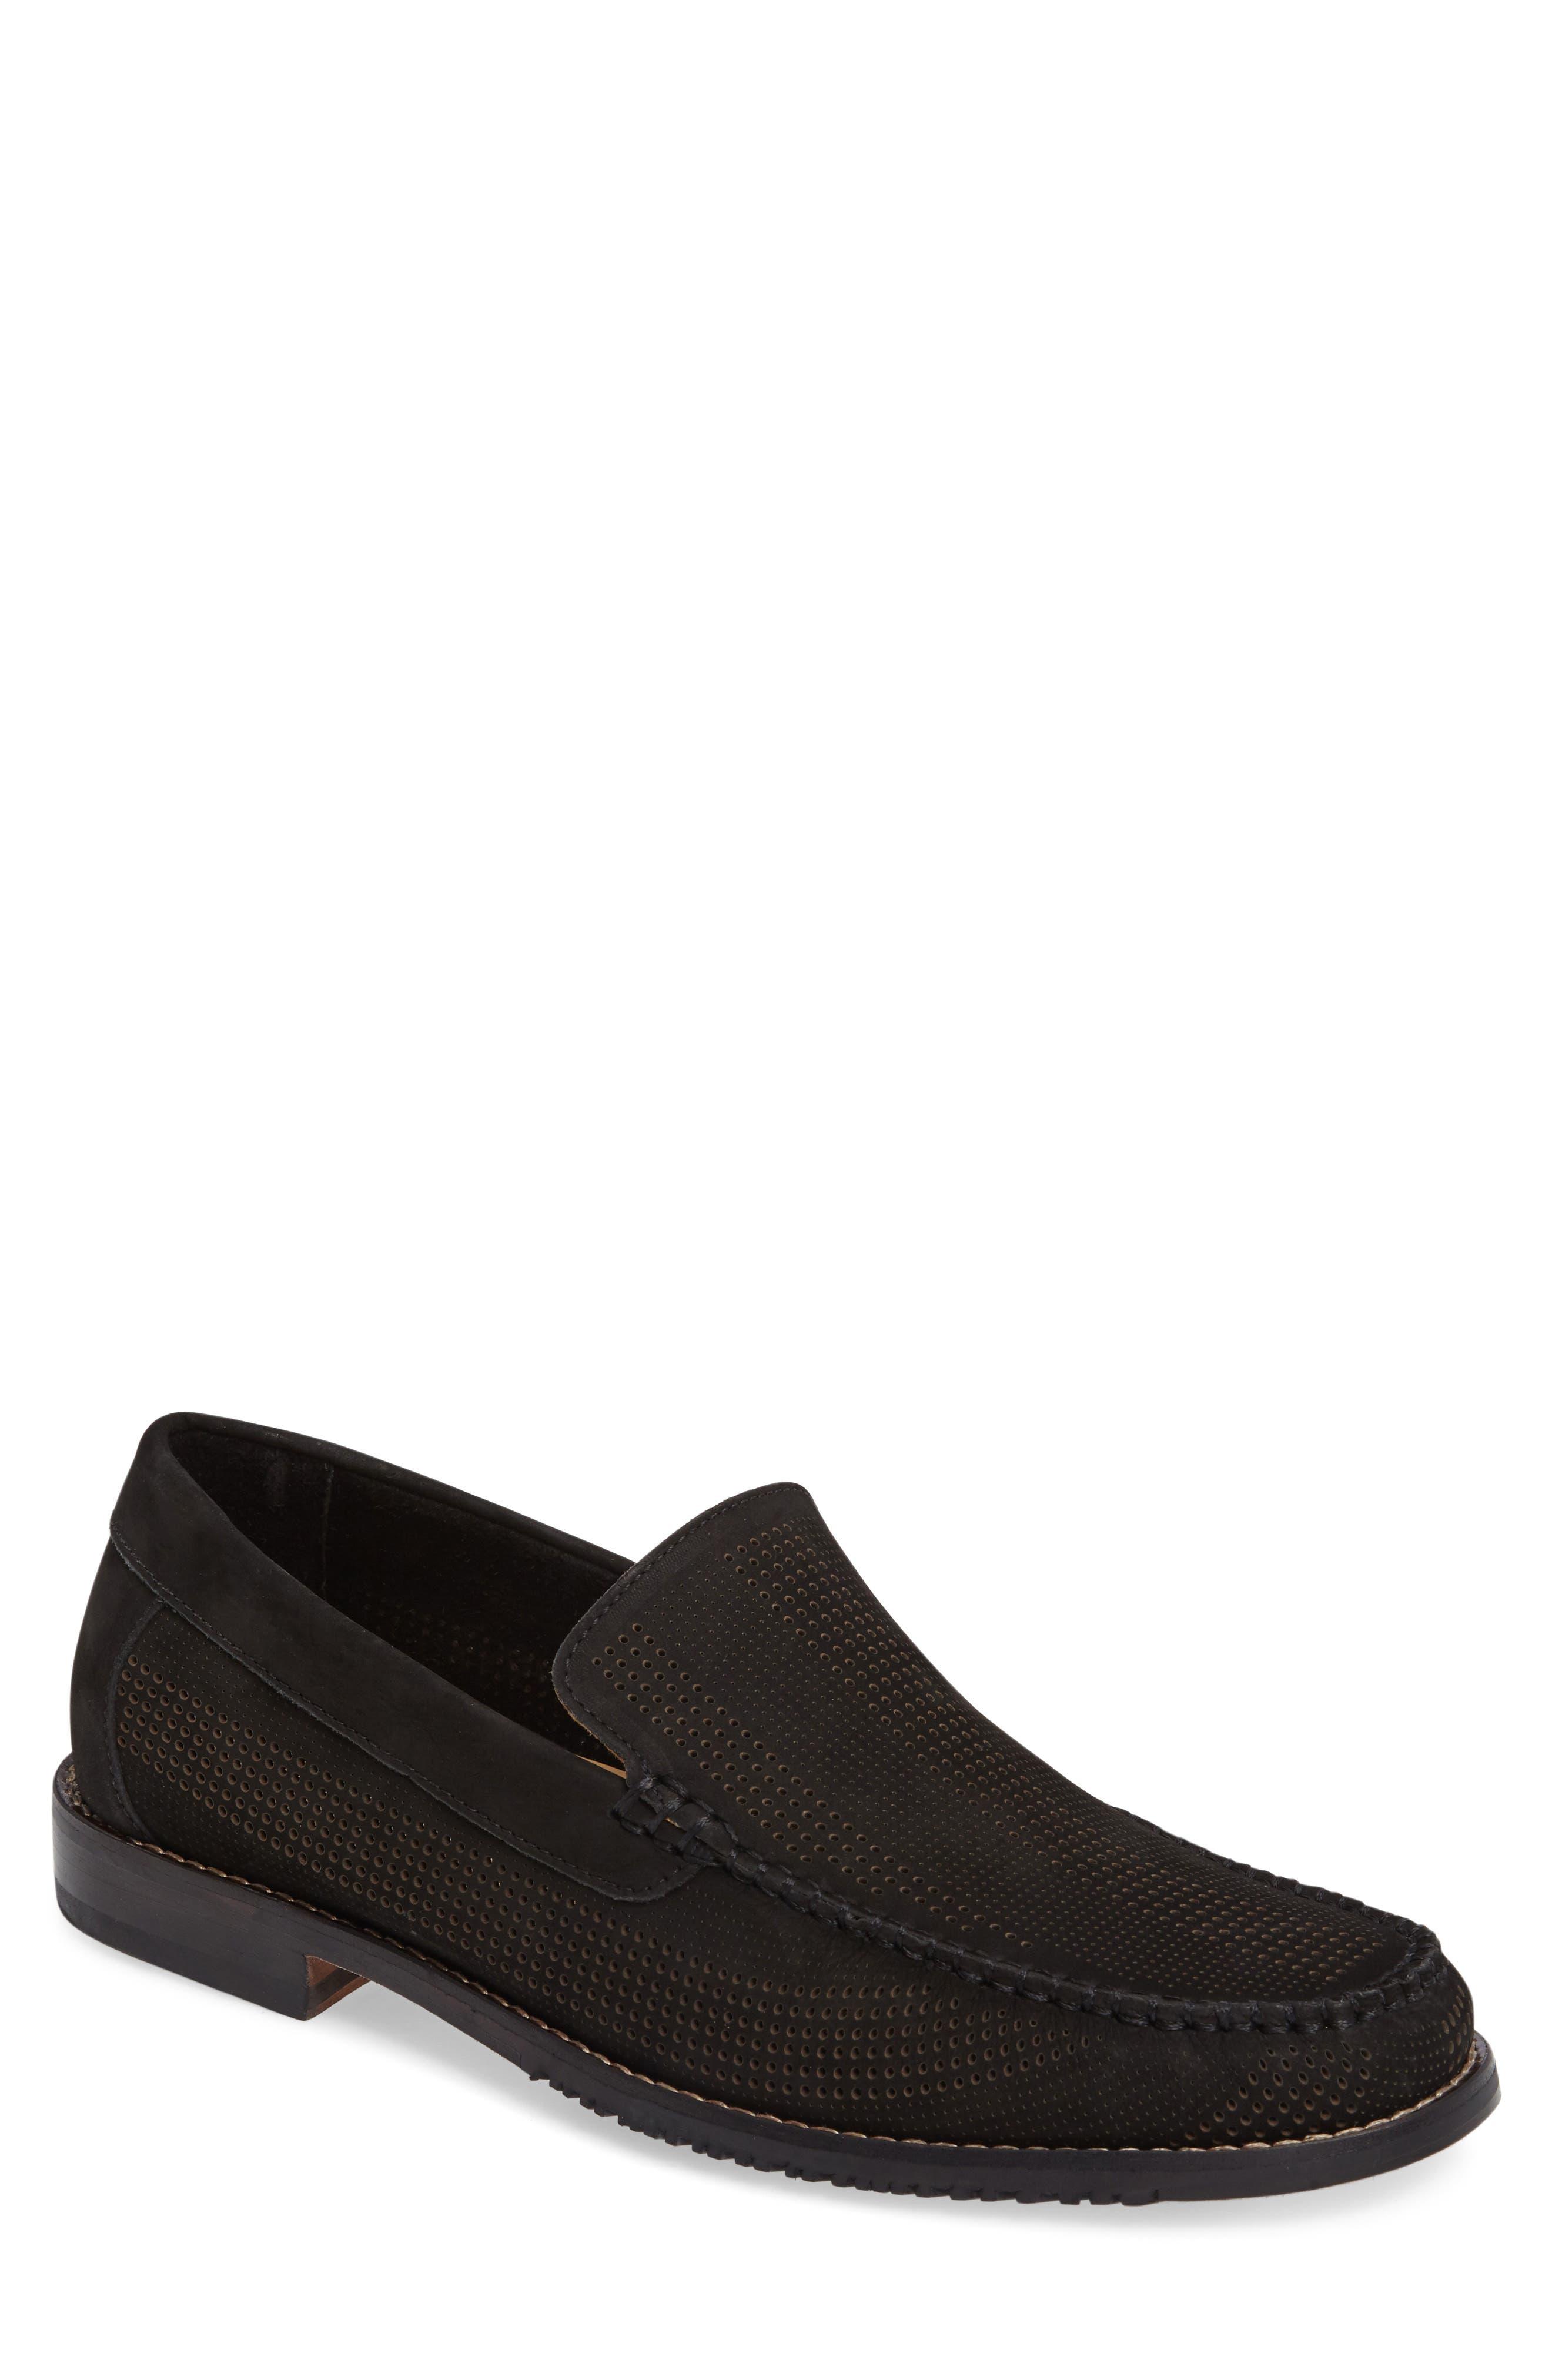 Felton Loafer,                         Main,                         color, 001